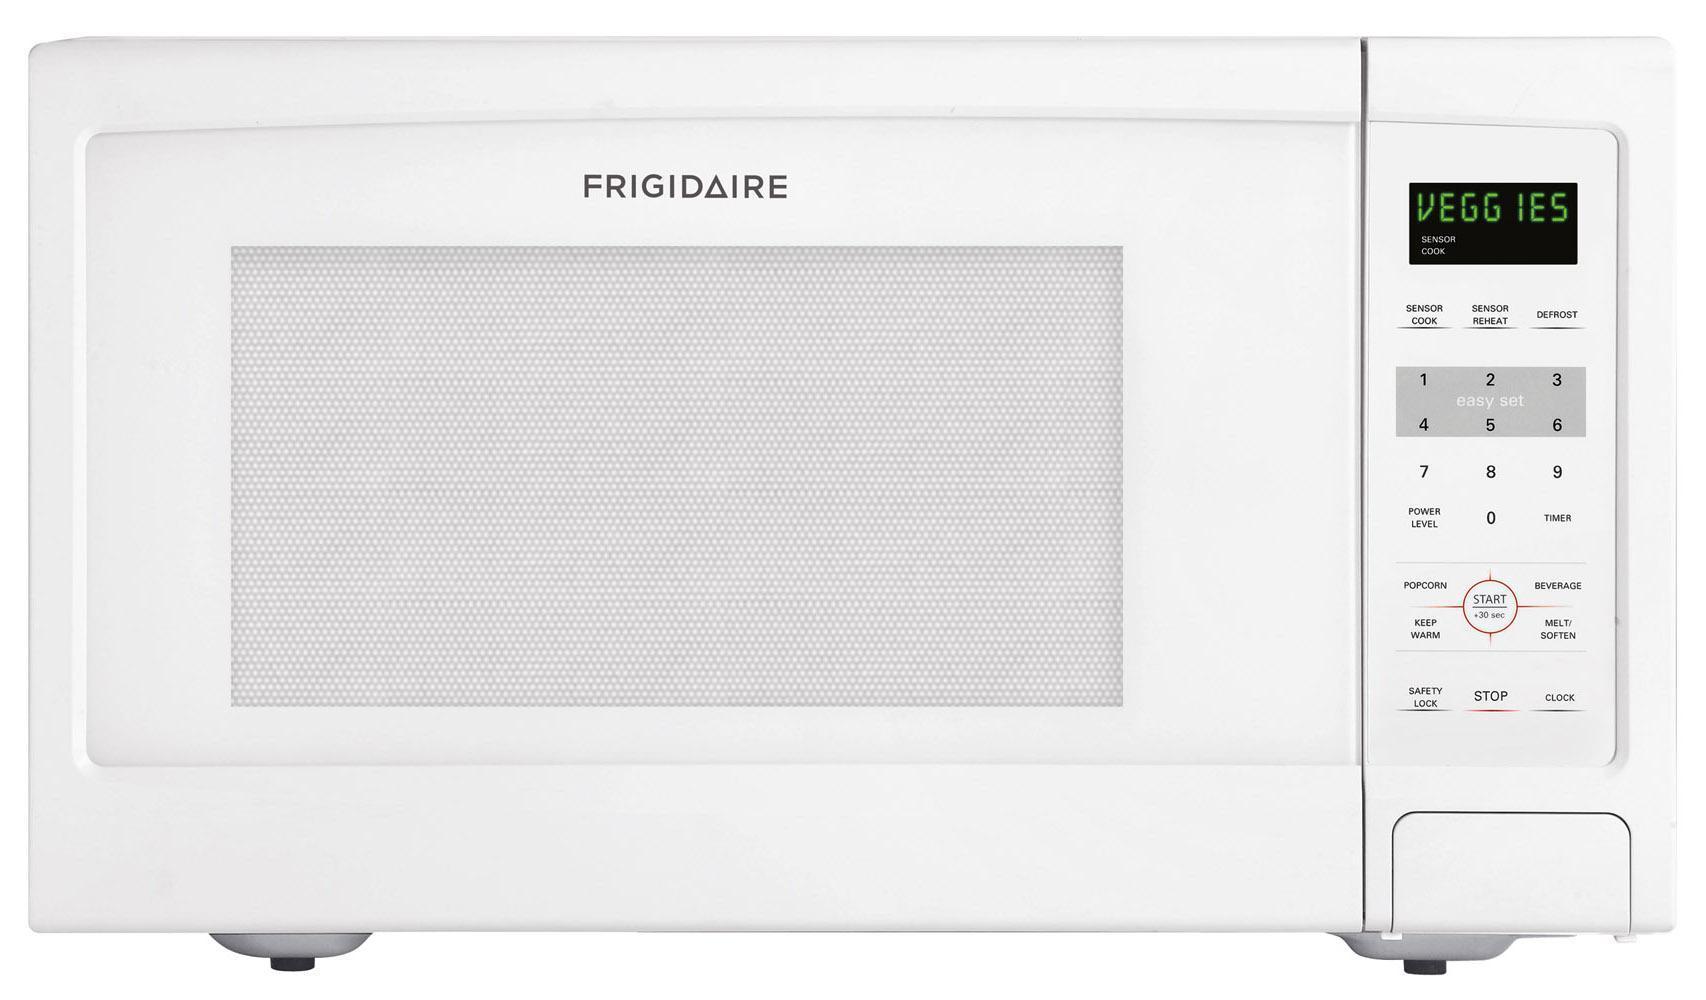 FFCE1638LB Frigidaire ffce1638lb Countertop Microwaves Black